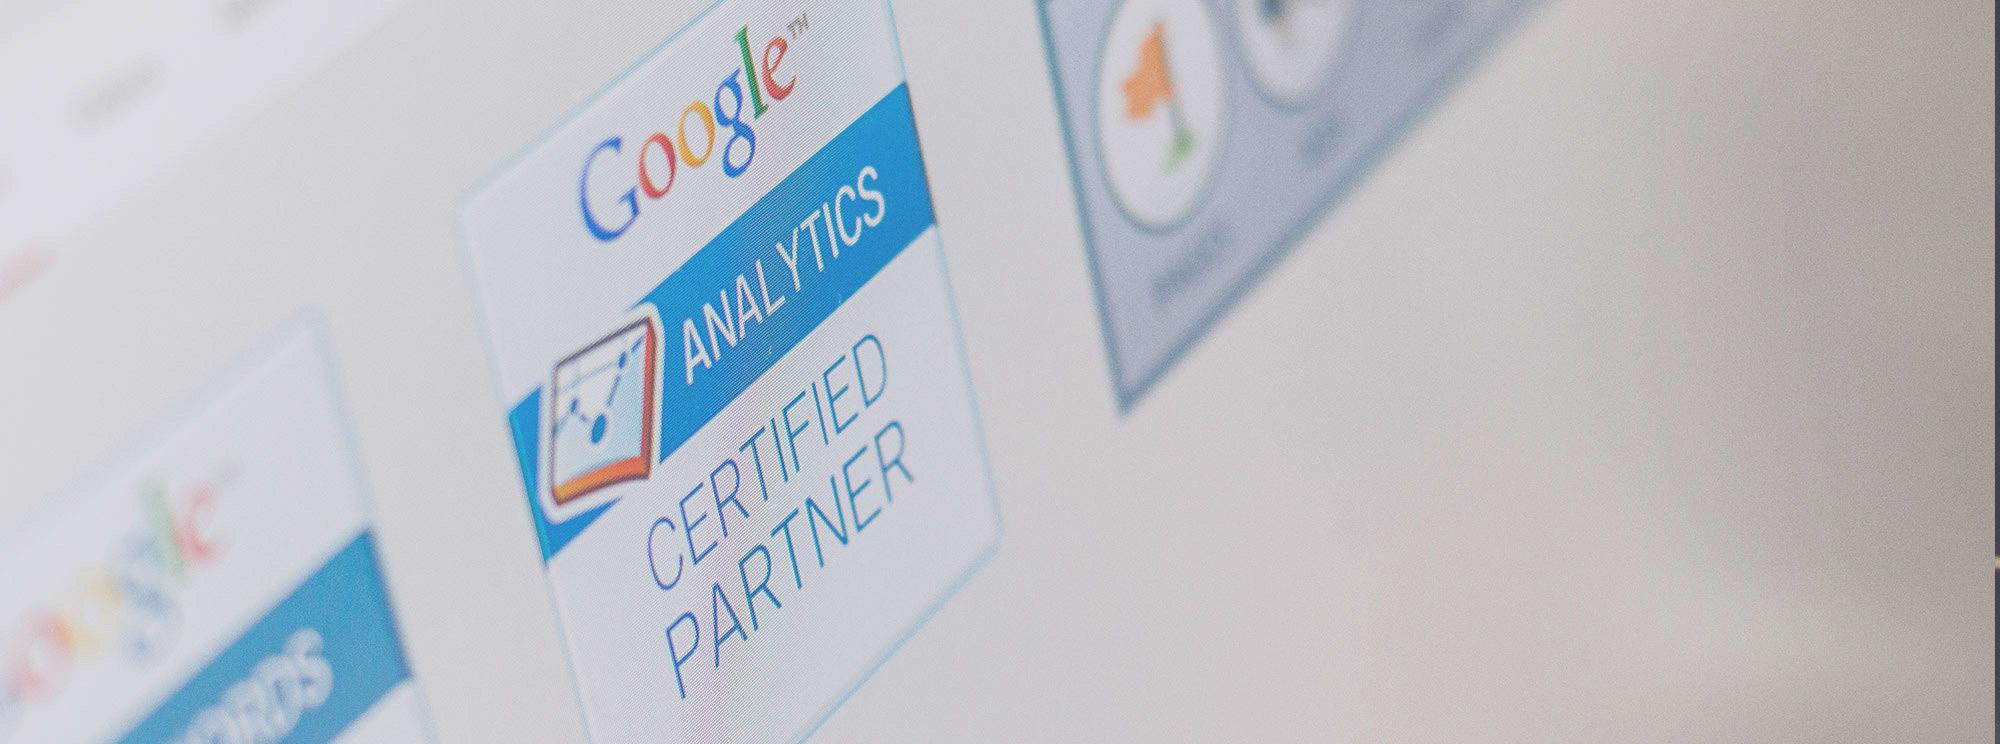 UpMyBiz rejoint le cercle fermé des Analytics Partners!